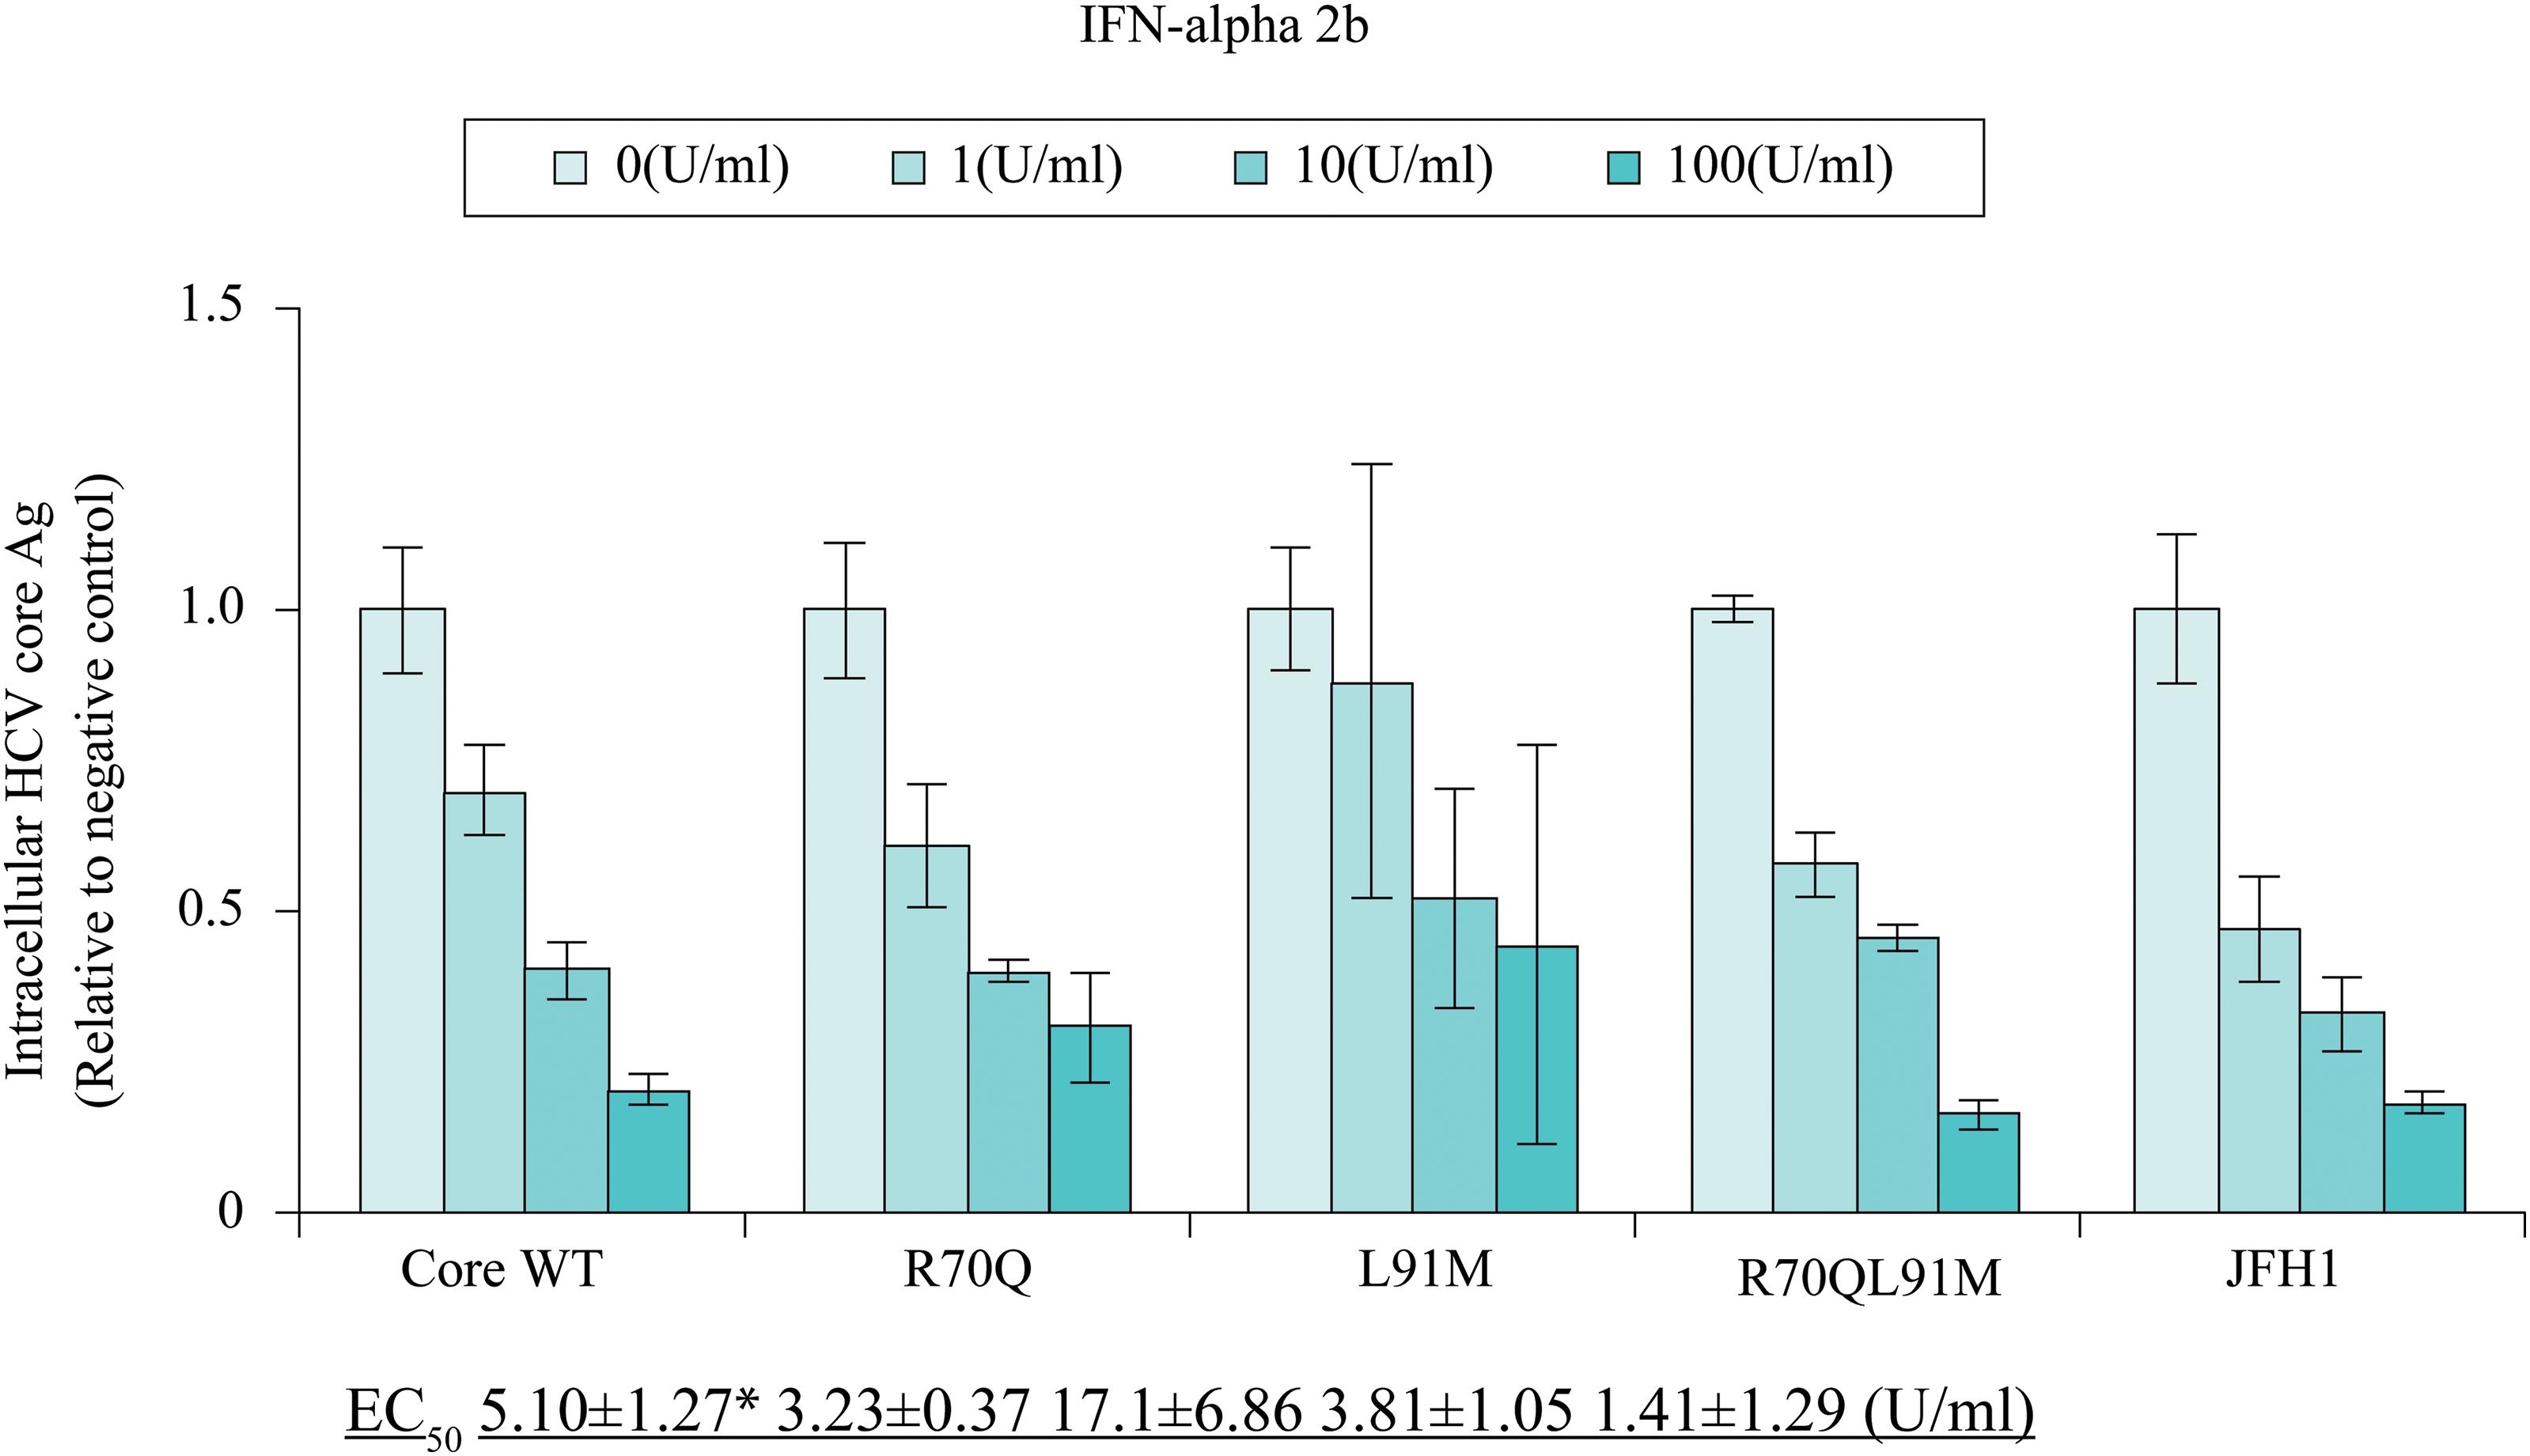 Comparison of interferon (IFN) sensitivity between TPF1-M170T and JFH-1.